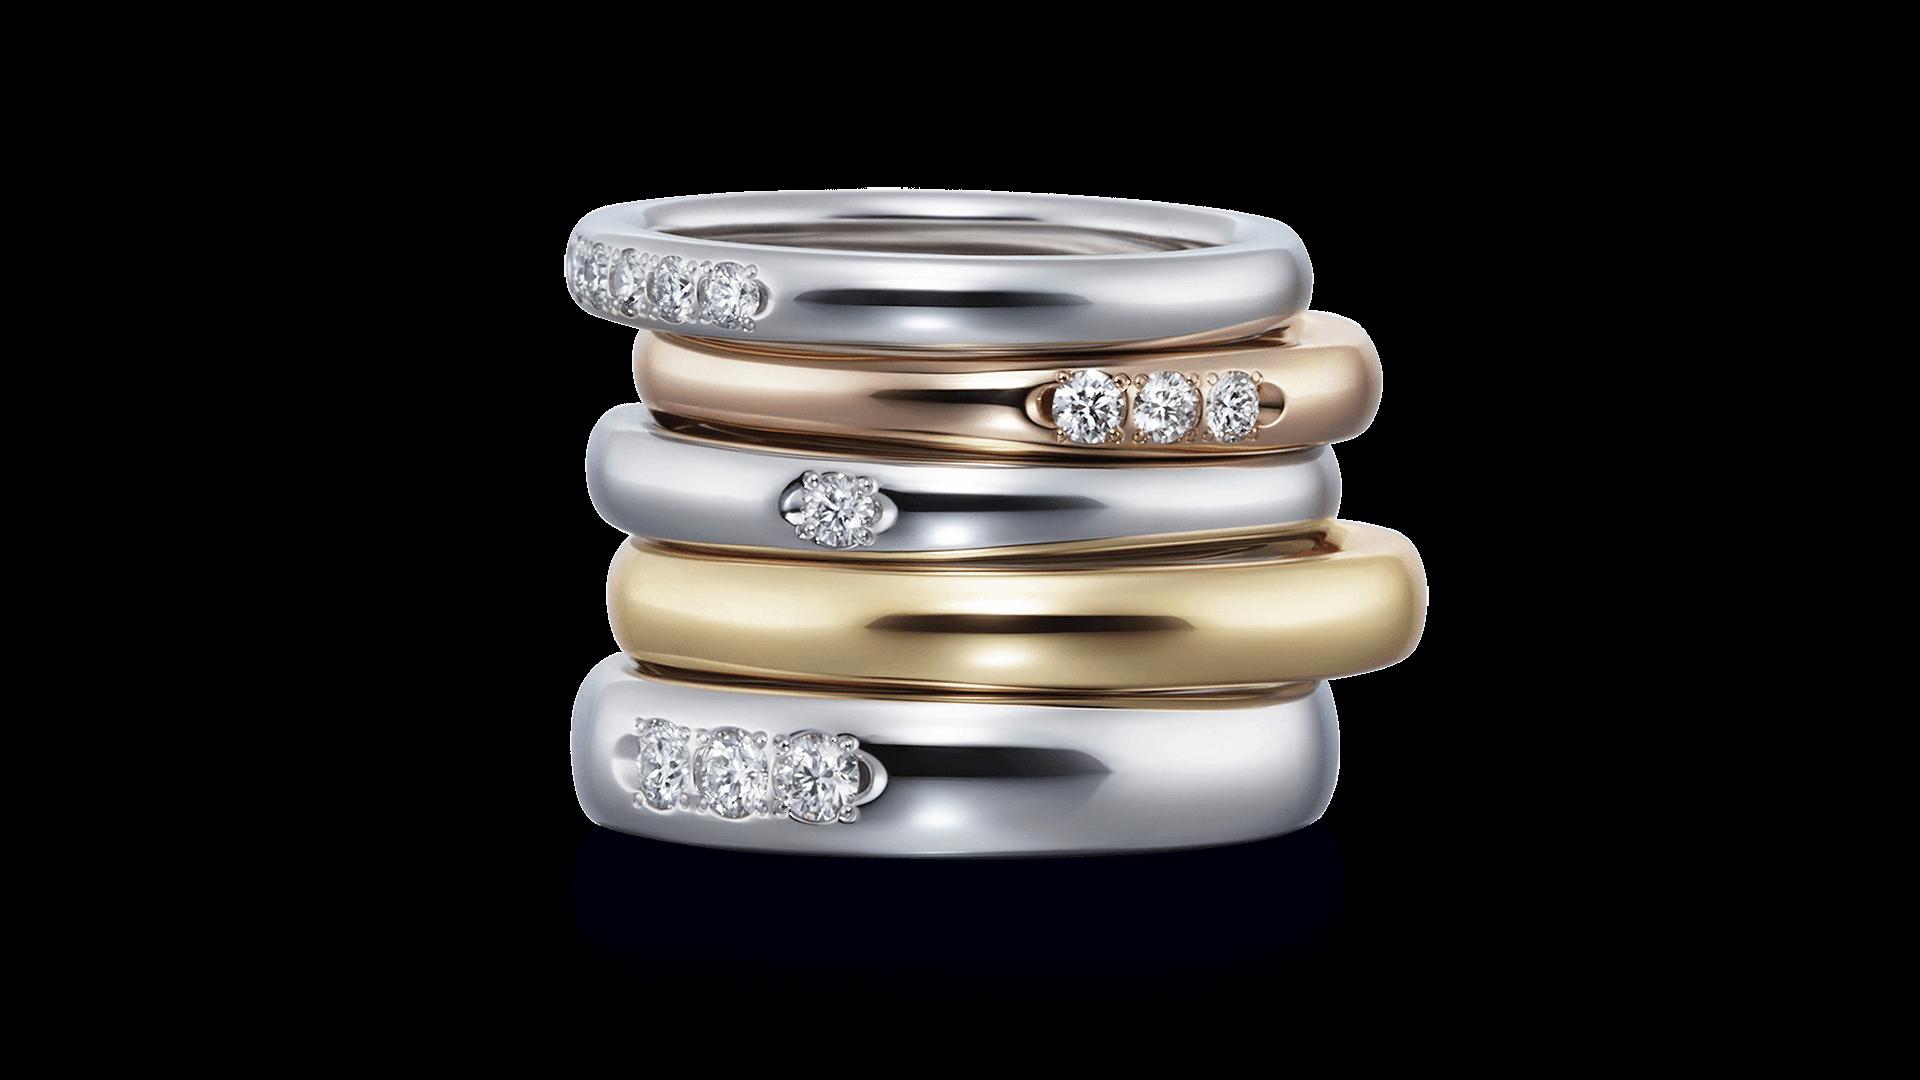 Origin Belief03 オリジンビリーフ03 | 結婚指輪サムネイル 3